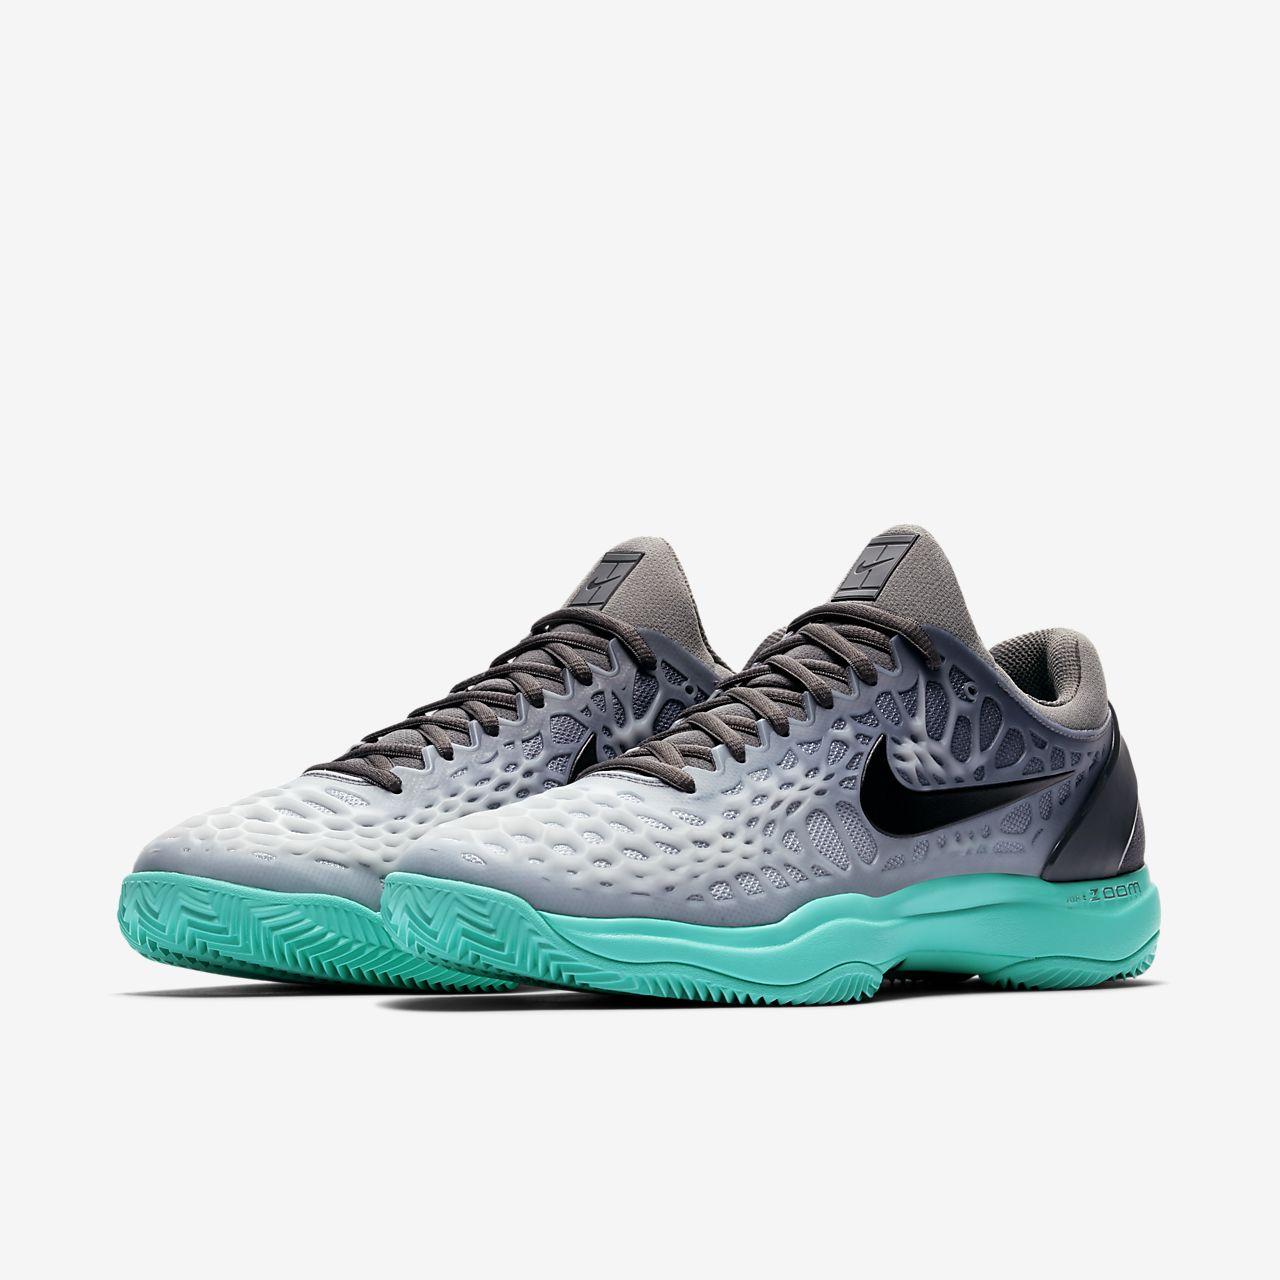 Nike Zoom Cage 3 Clay Men's Tennis Shoes Black pQ6306Y